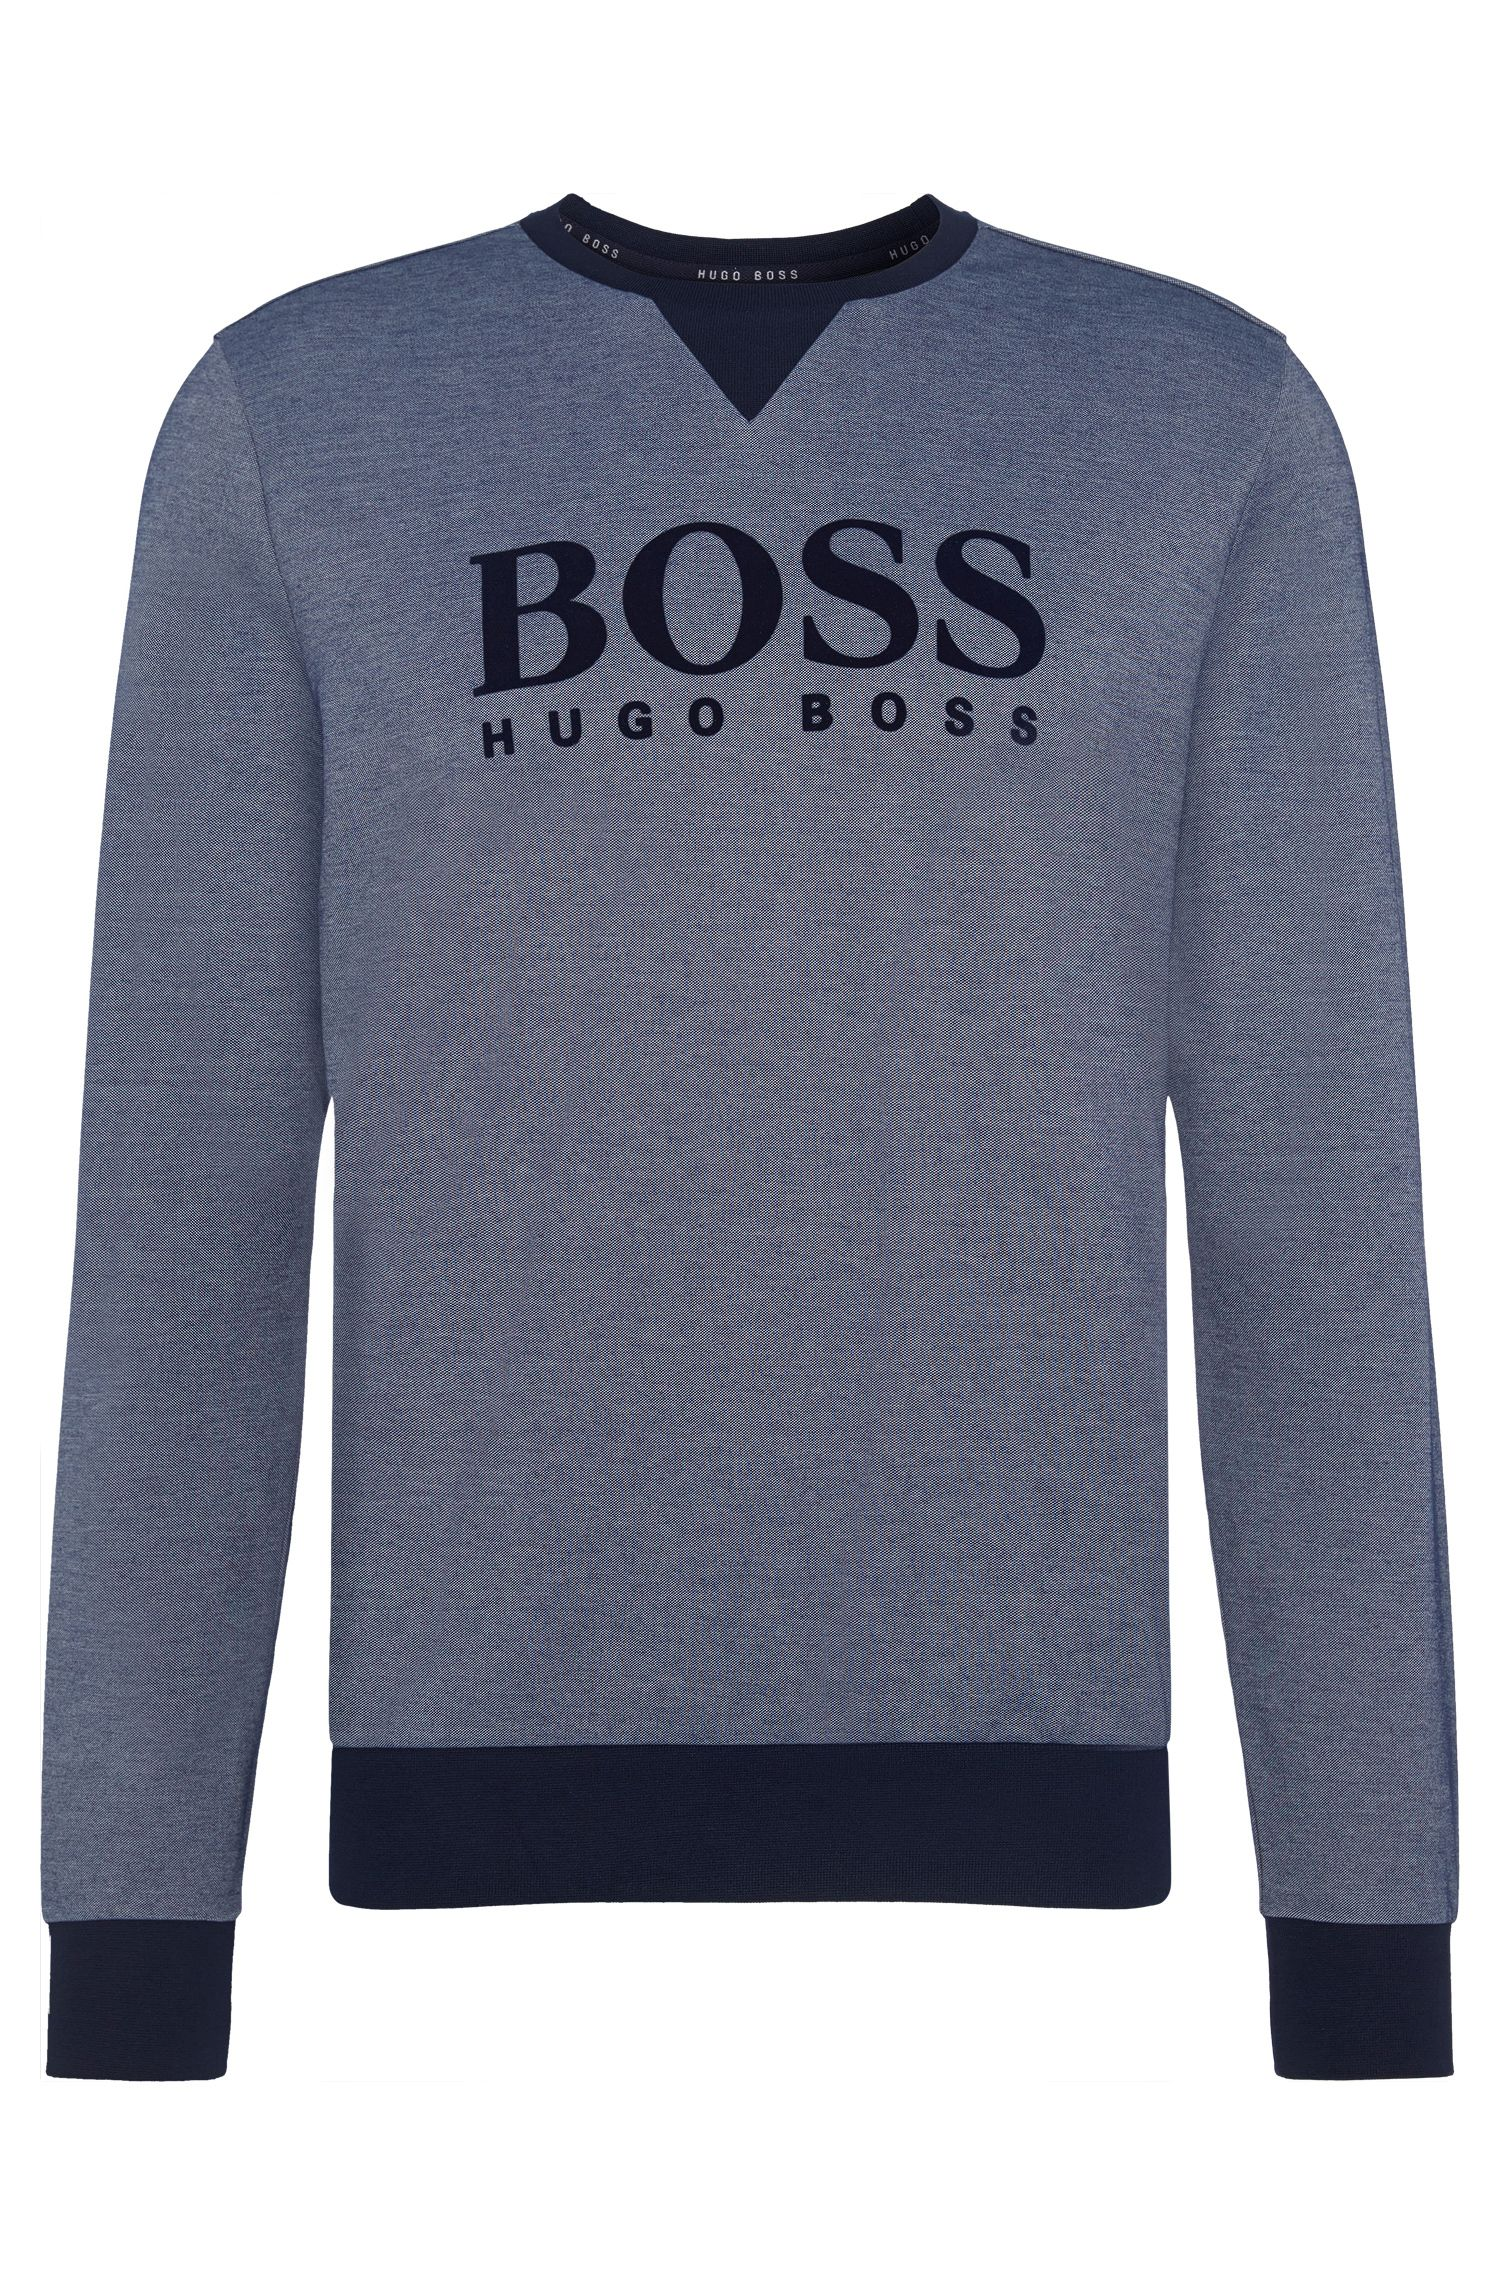 Cotton Blend Flock Logo Sweatshirt | Sweatshirt